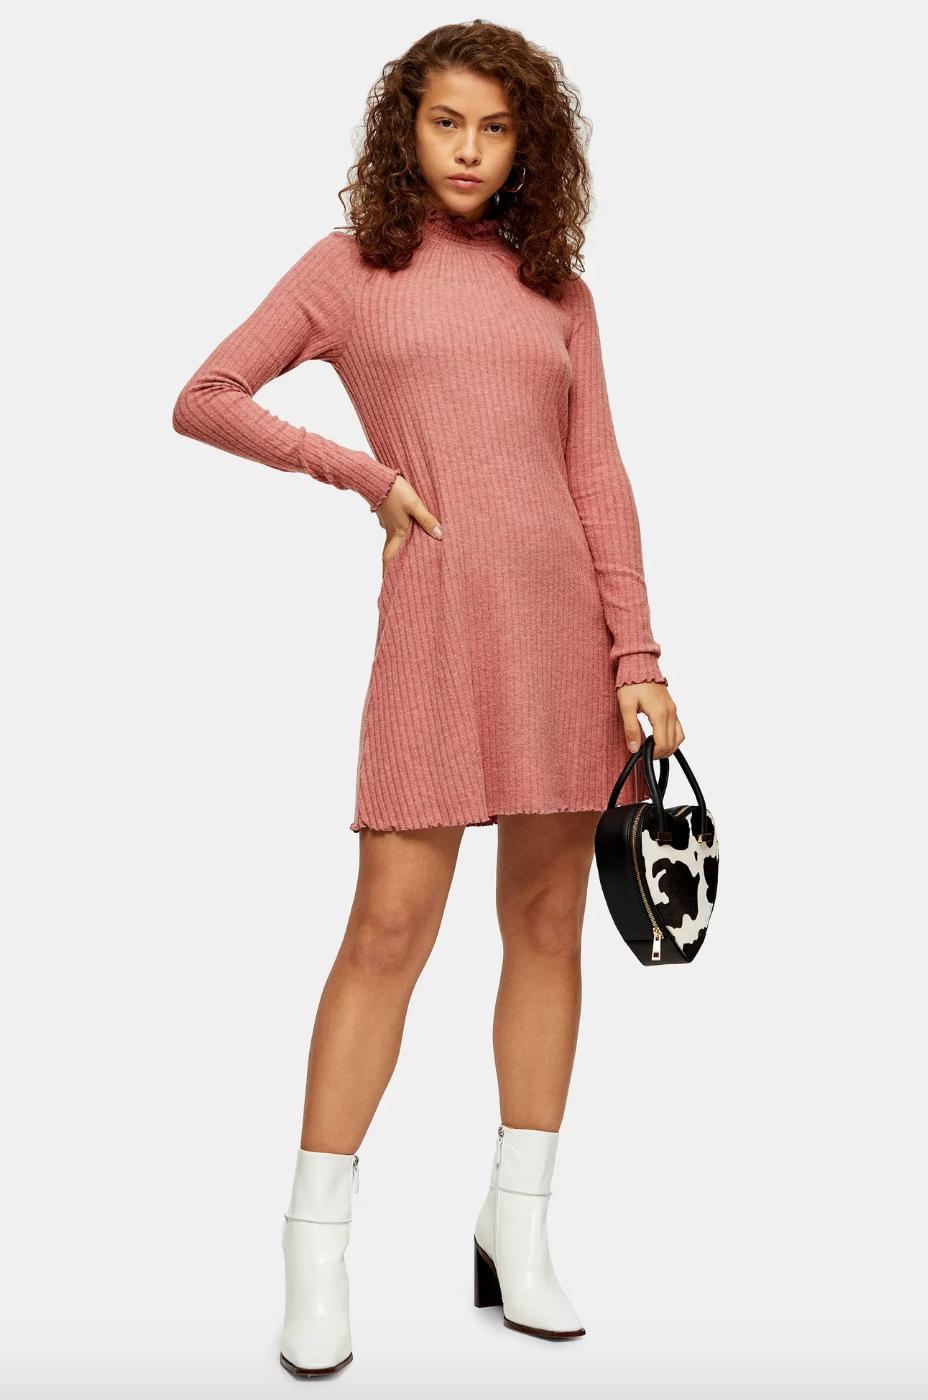 Blush Pink Cut And Sew Shirred Mini Dress,  Topshop